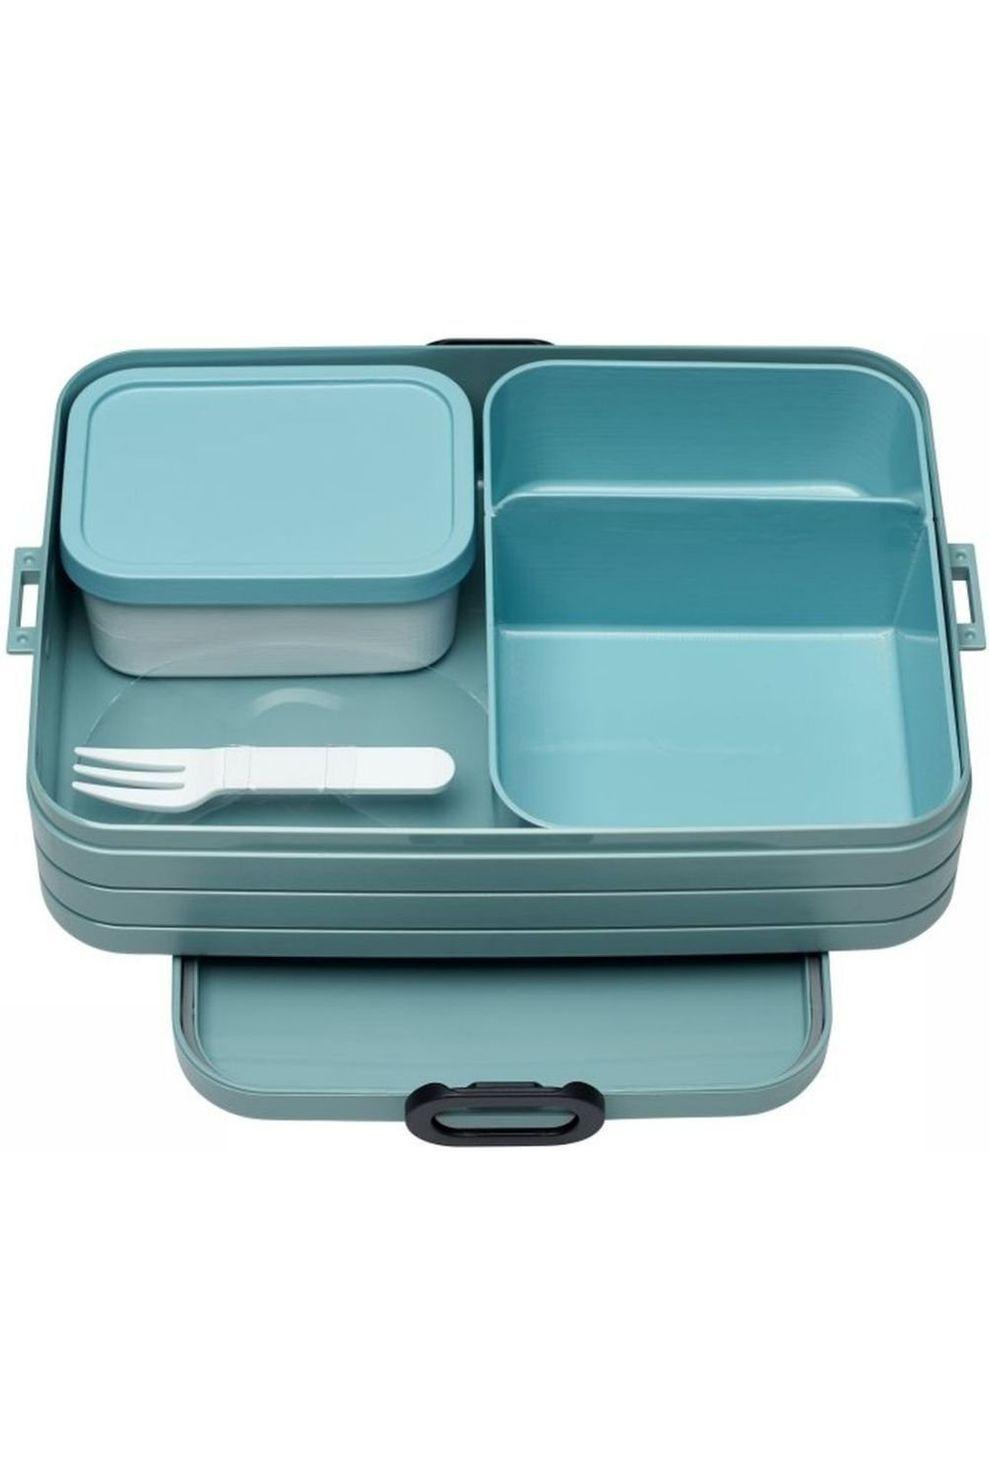 Mepal Voorraadpot Lunchbox Take A Break Bento Large - Blauw